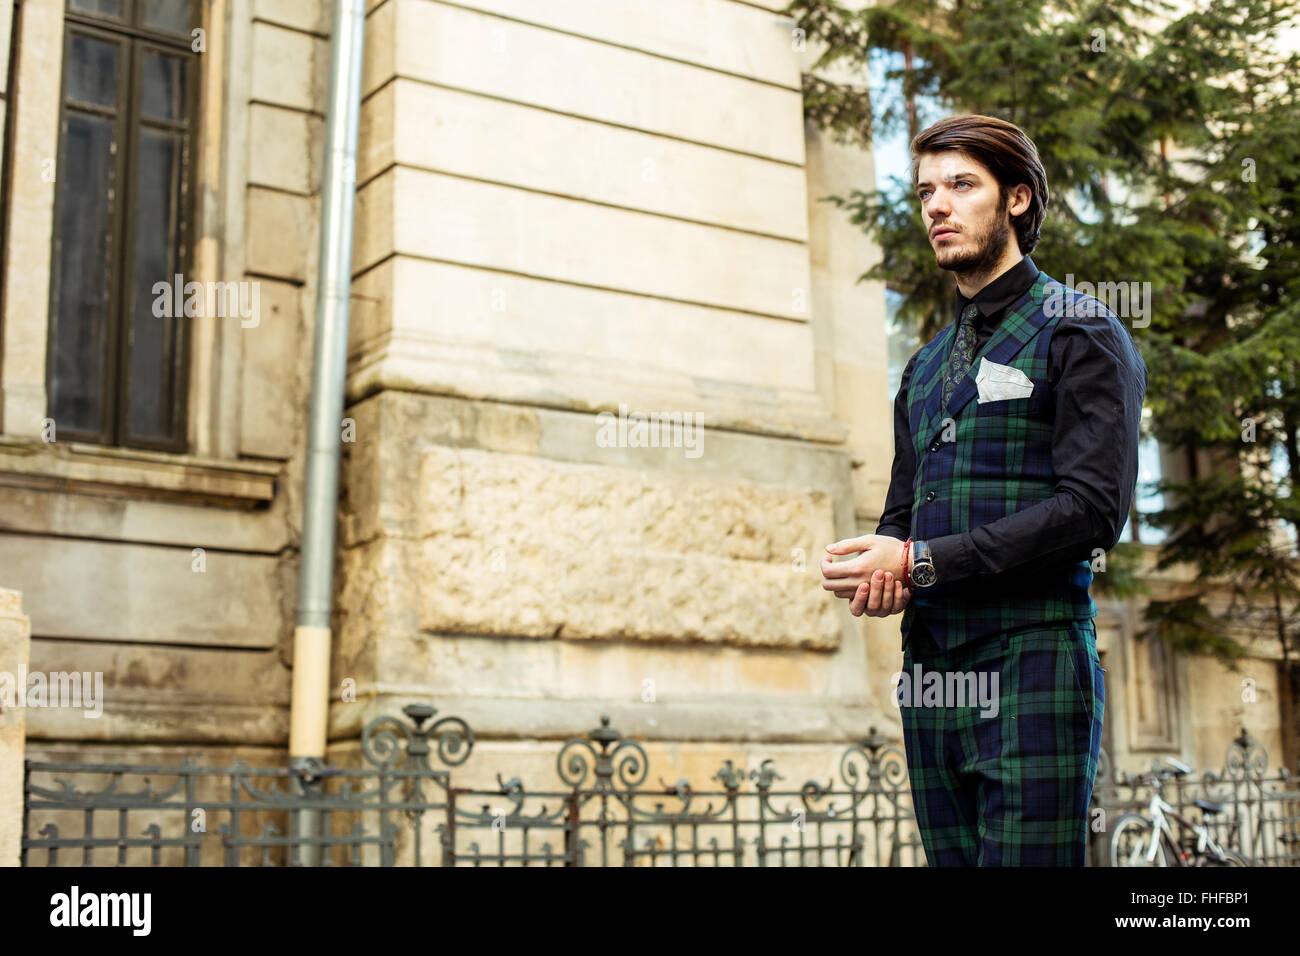 elegant man standing outside, wearing green plaid costume - Stock Image